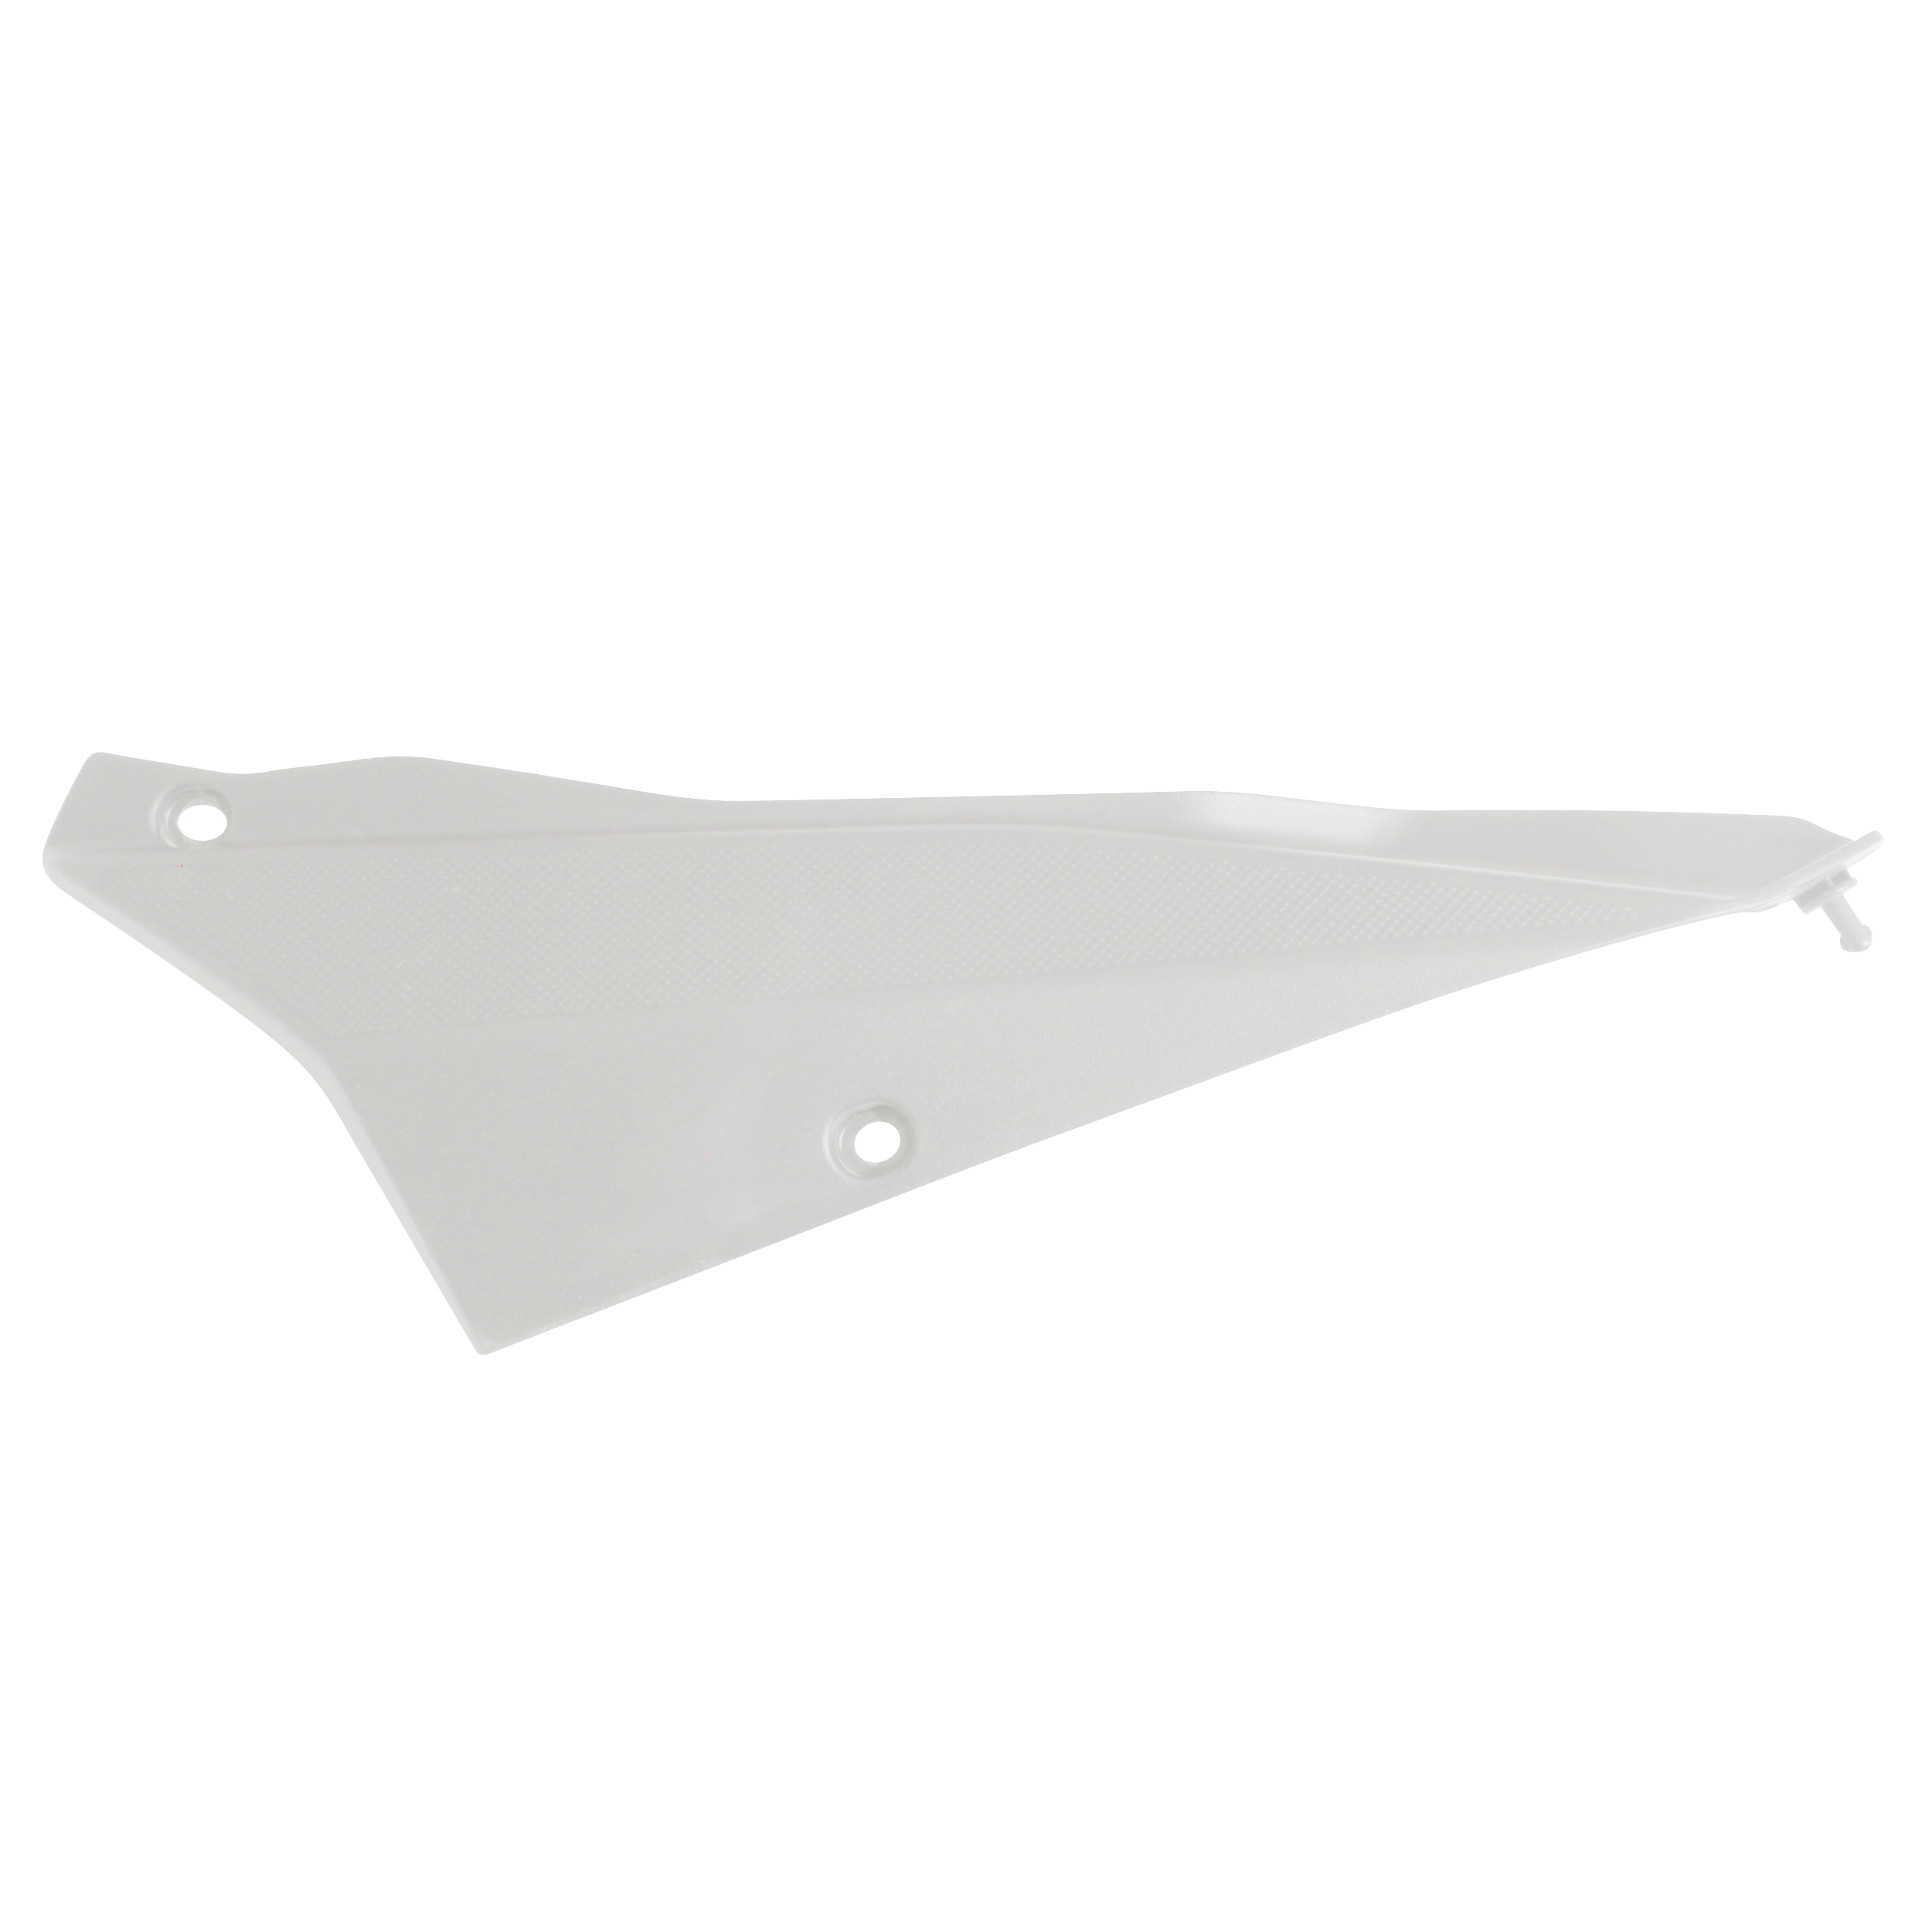 Cache 1Tek Origine arrière gauche blanc brillant Derbi Senda DRD 2011-